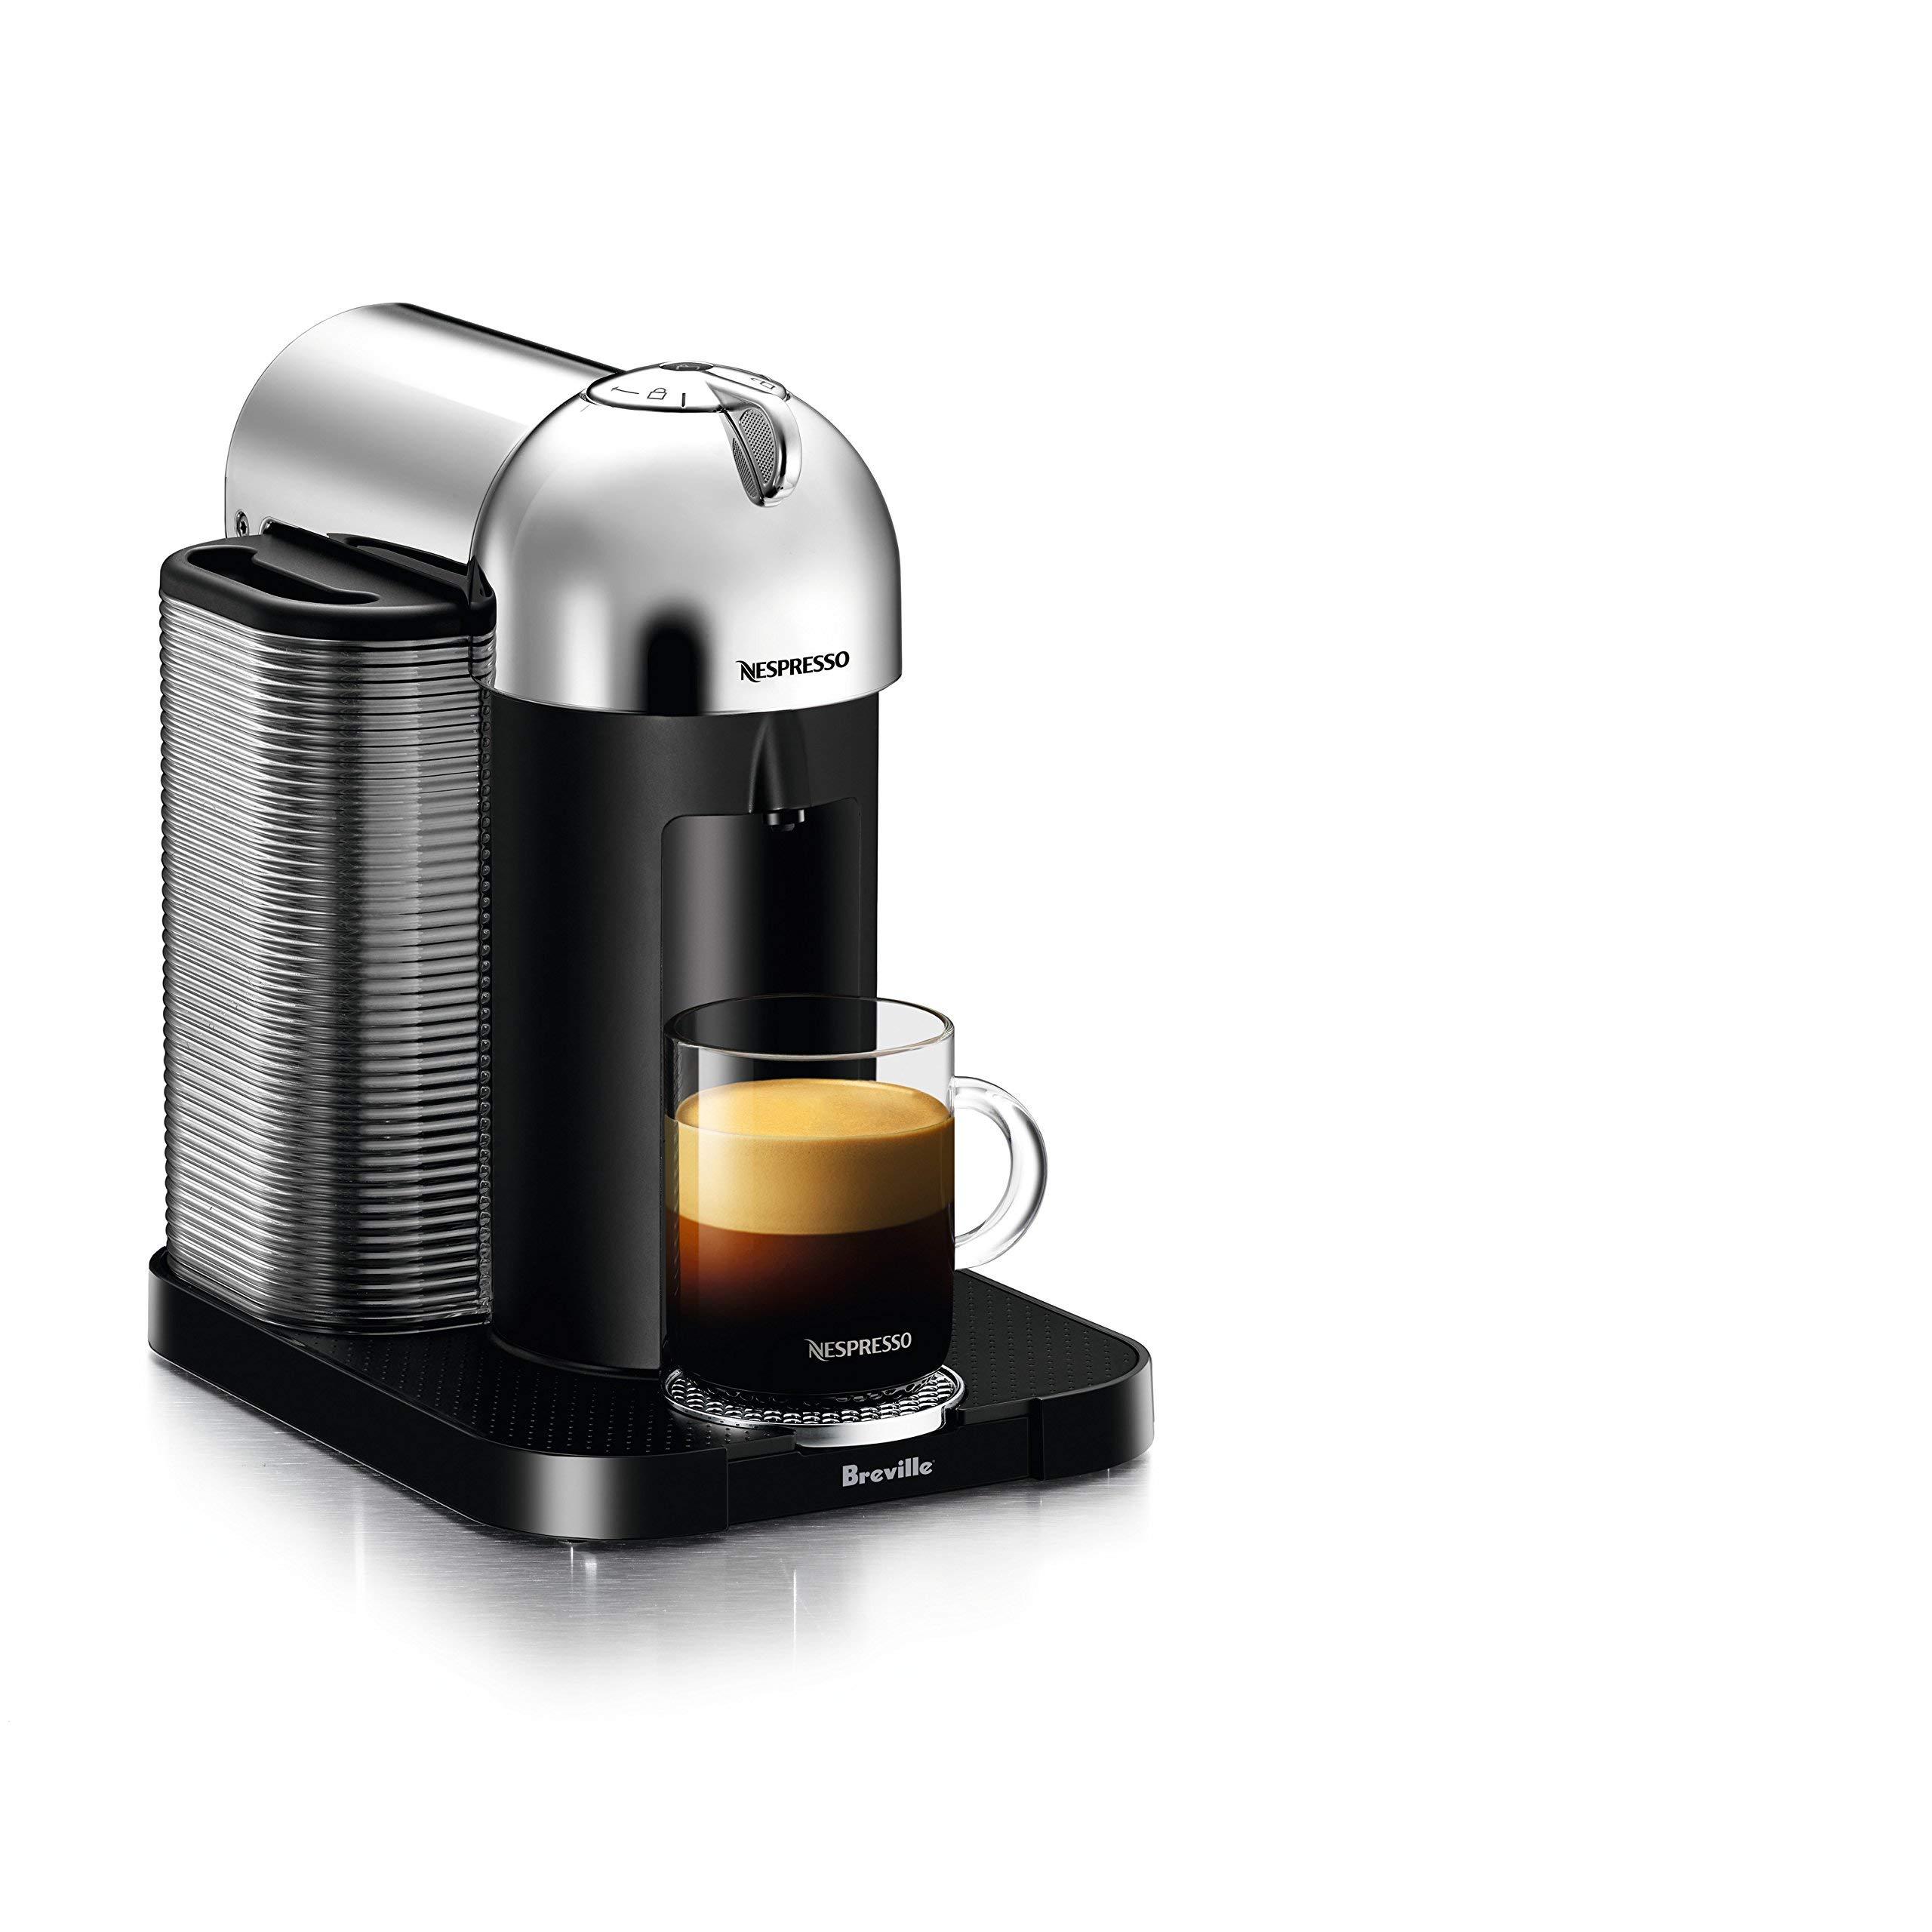 Nespresso Vertuo Coffee and Espresso Machine by Breville (Renewed) (Chrome) by Breville